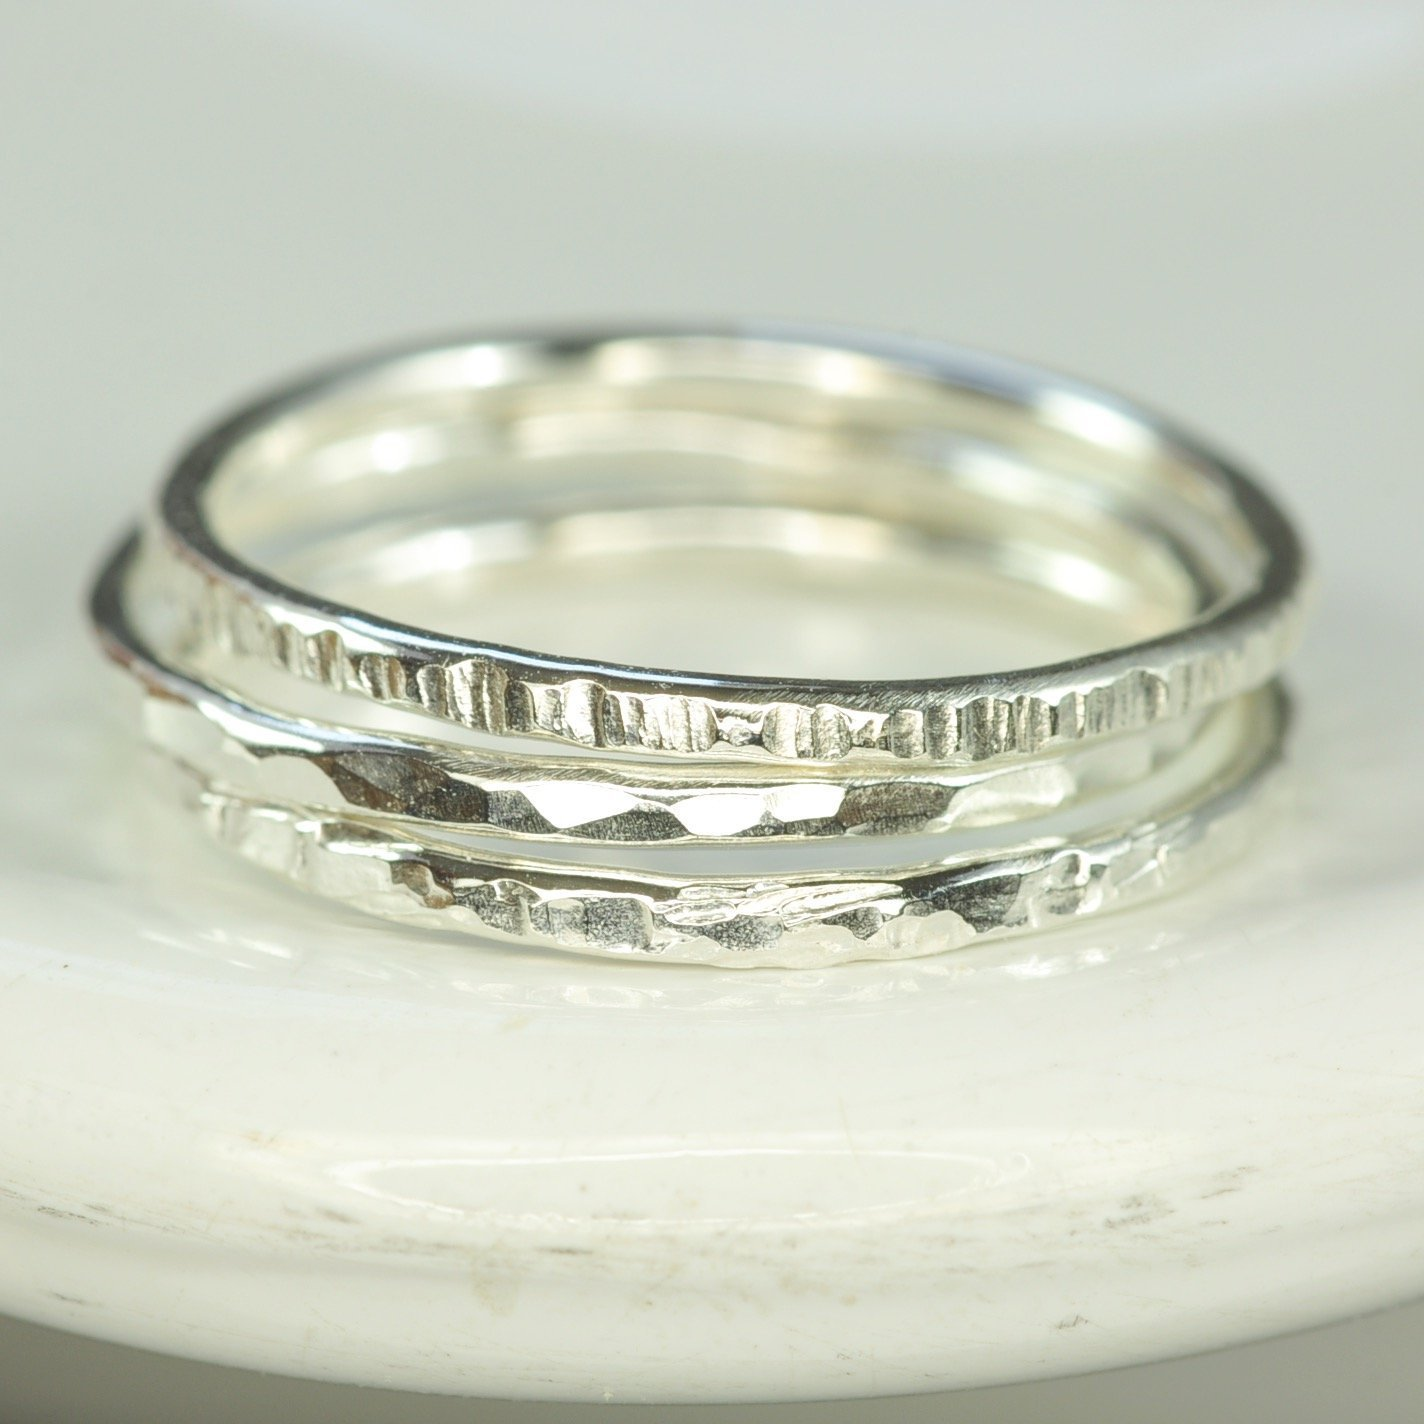 Stacking Silver Rings Silver Rings Set of 2 Silver Rings,Hammered Skinny Rings,Silver Skinny Rings Seamless Rings Stacking Rings